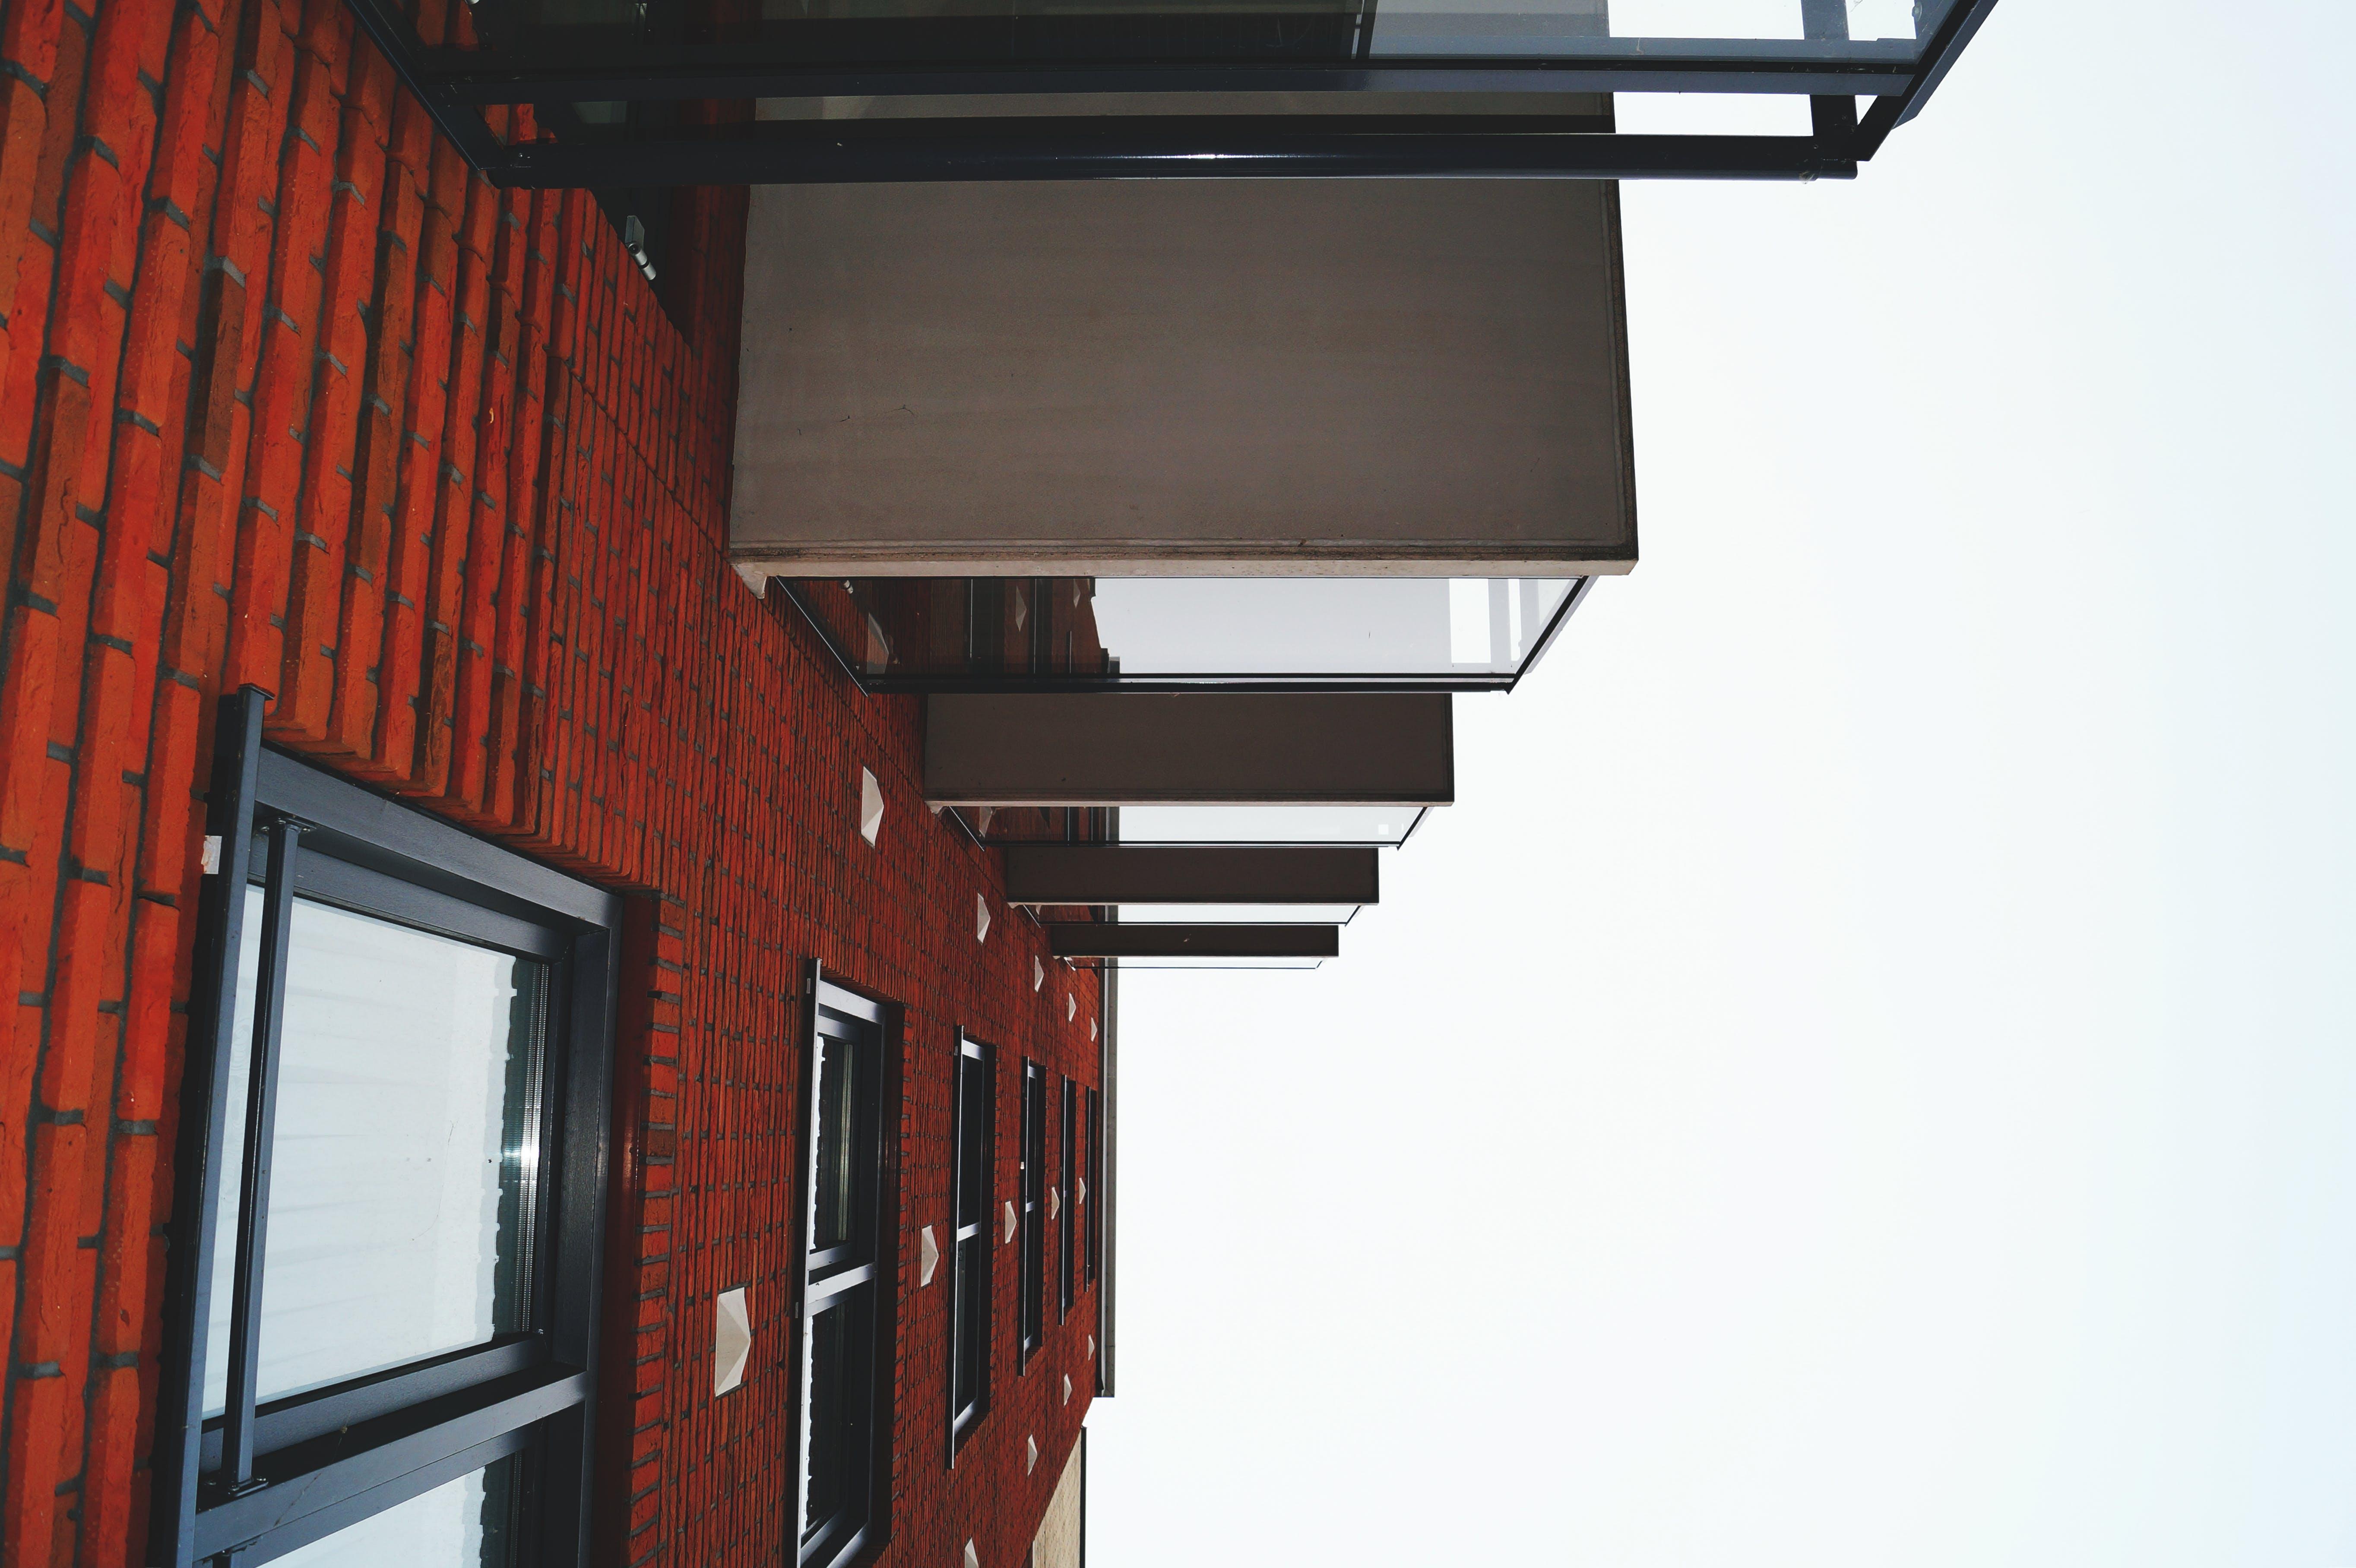 architecture, bricks, building